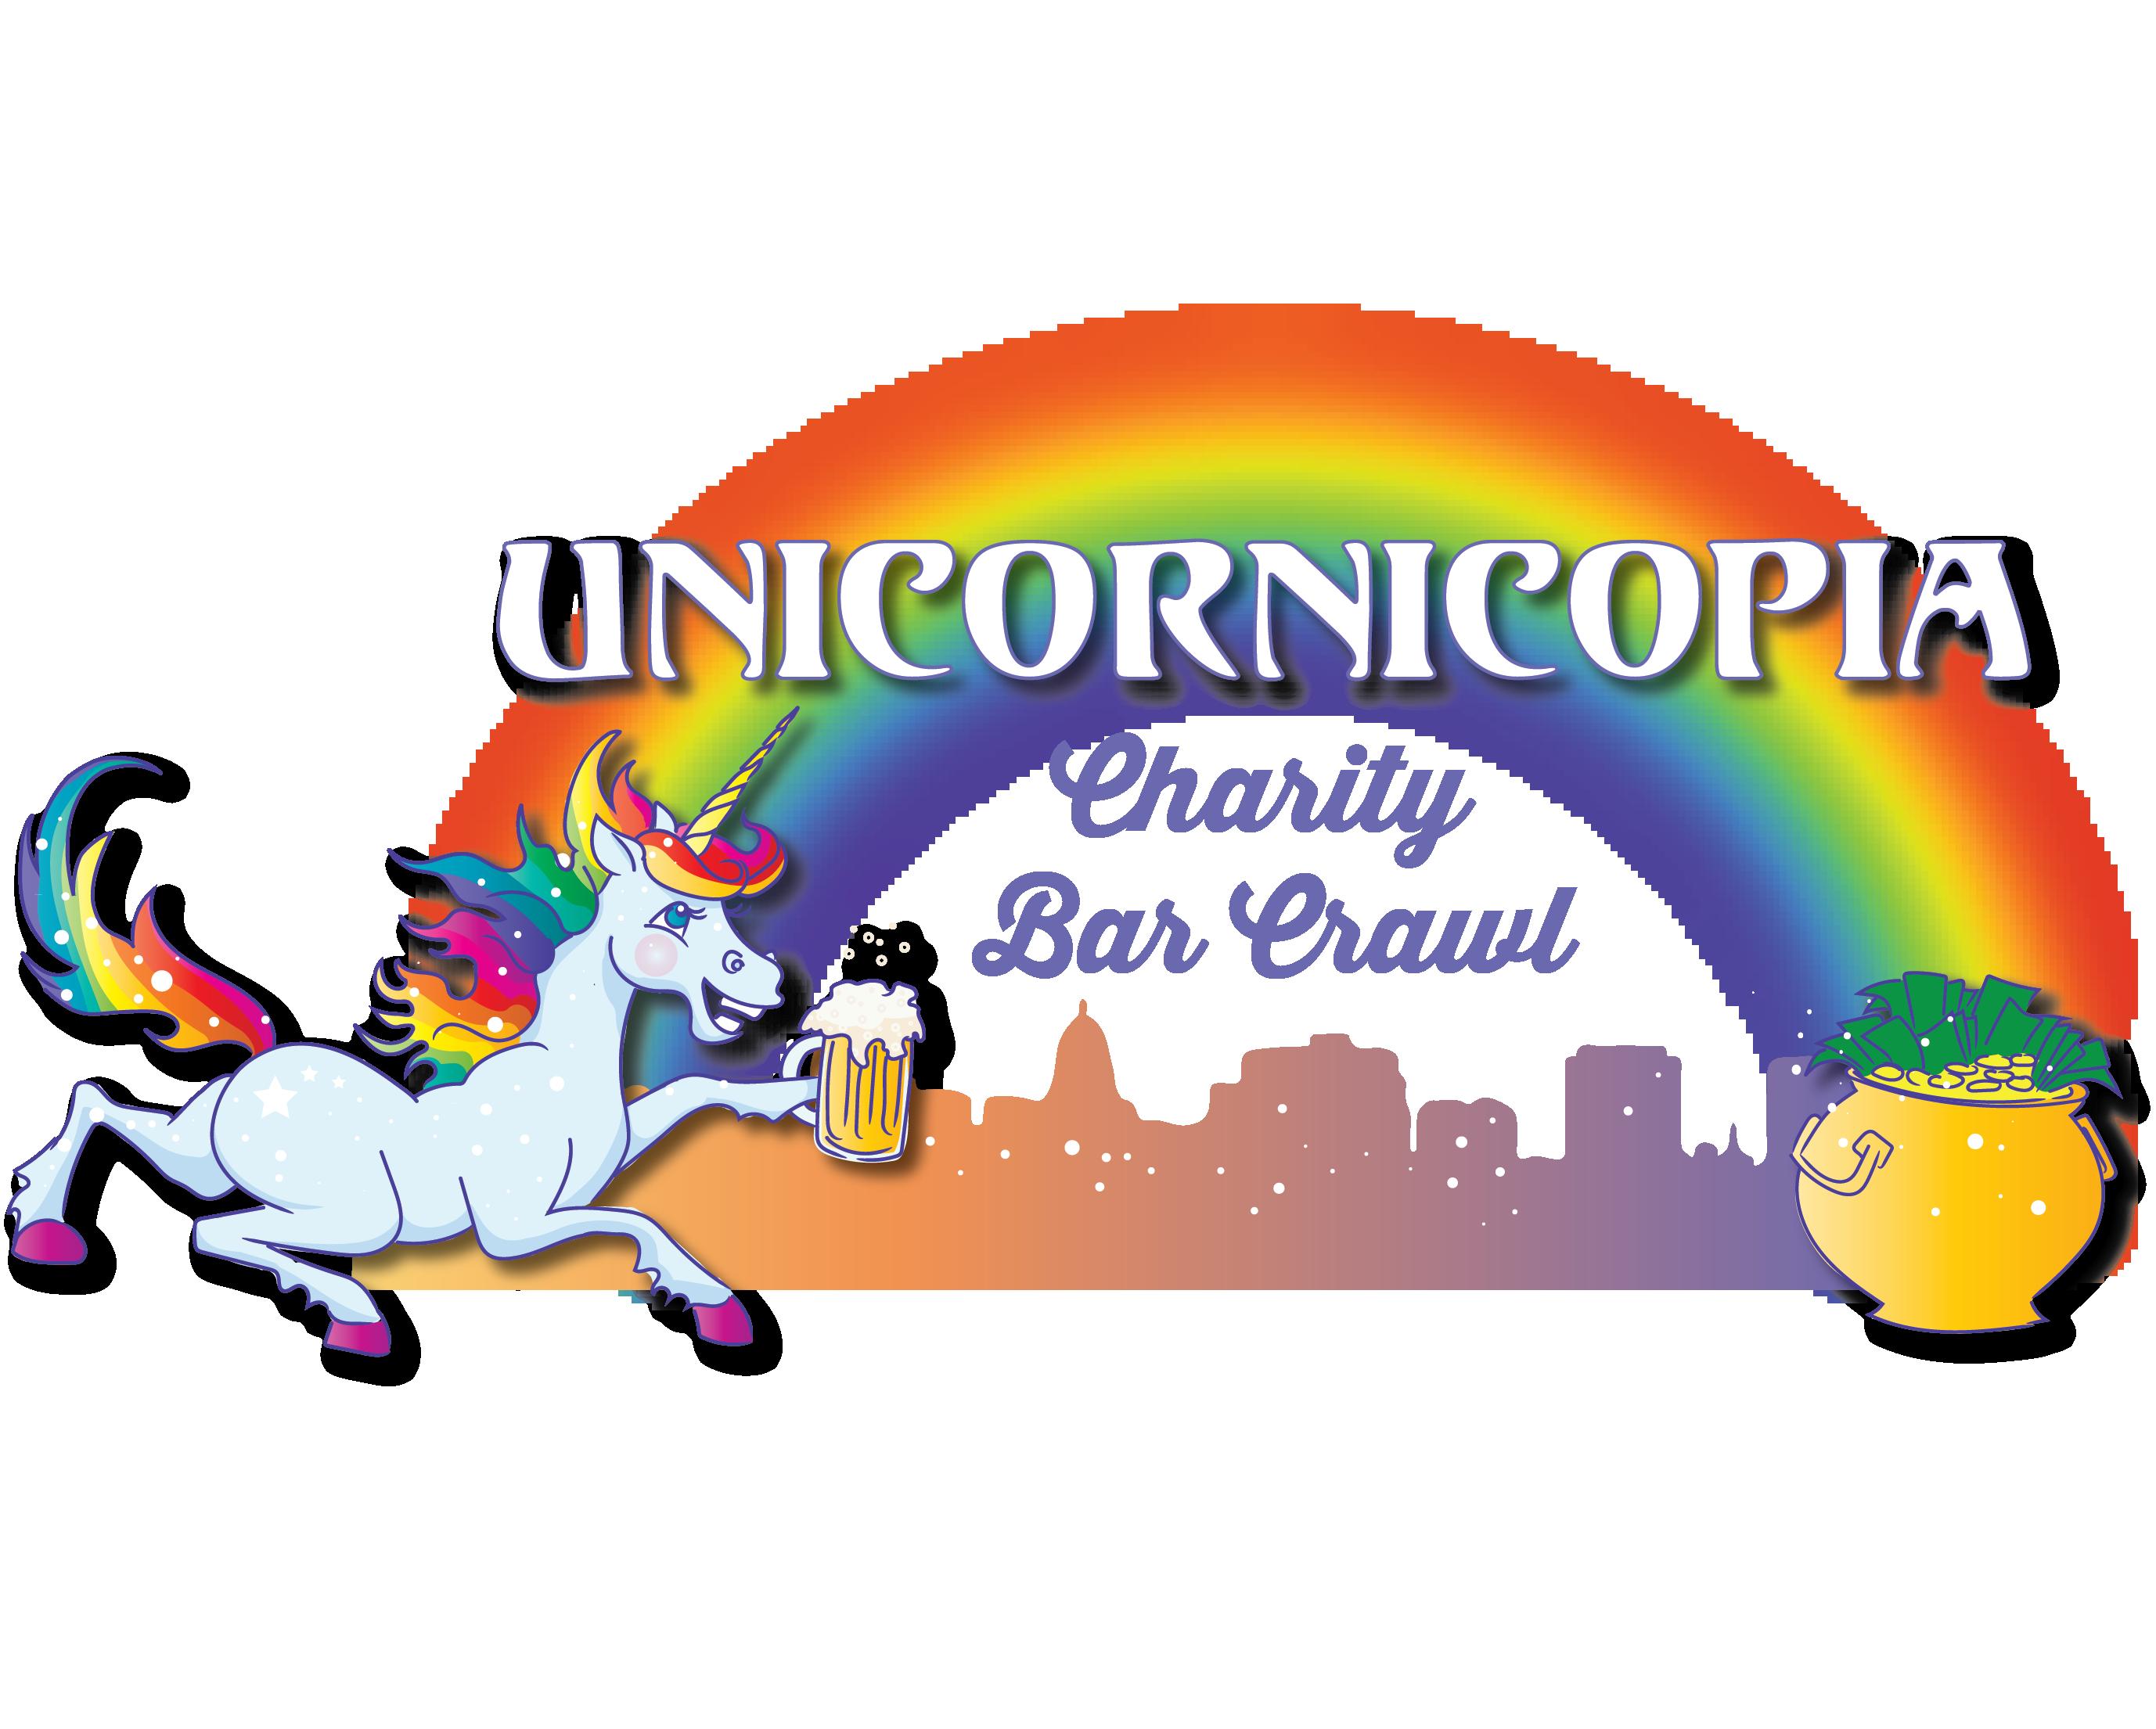 Unicornicopia